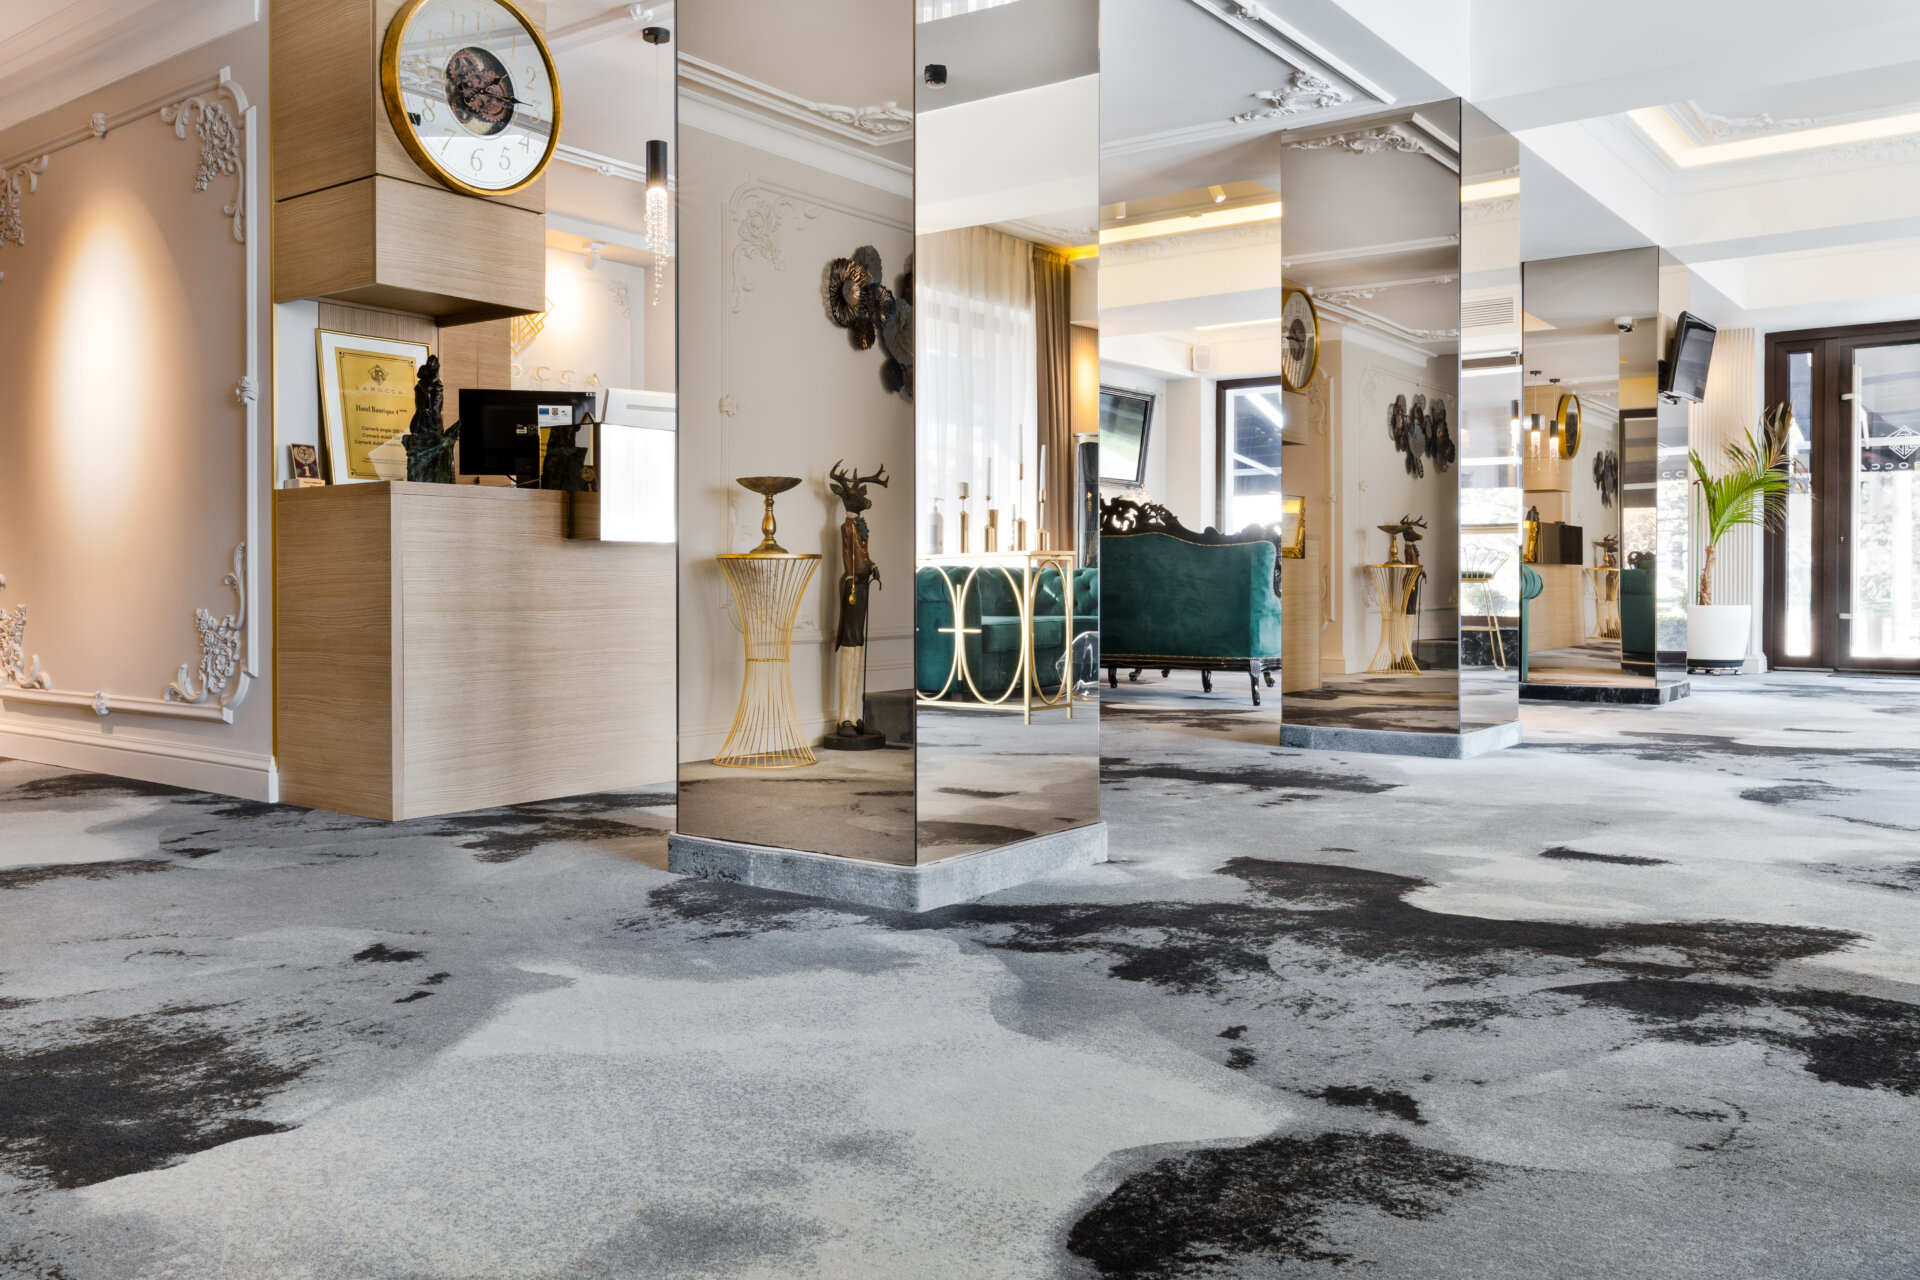 20210303-carpet&more-hotel-rocca-craiovaby-hugmedia-02